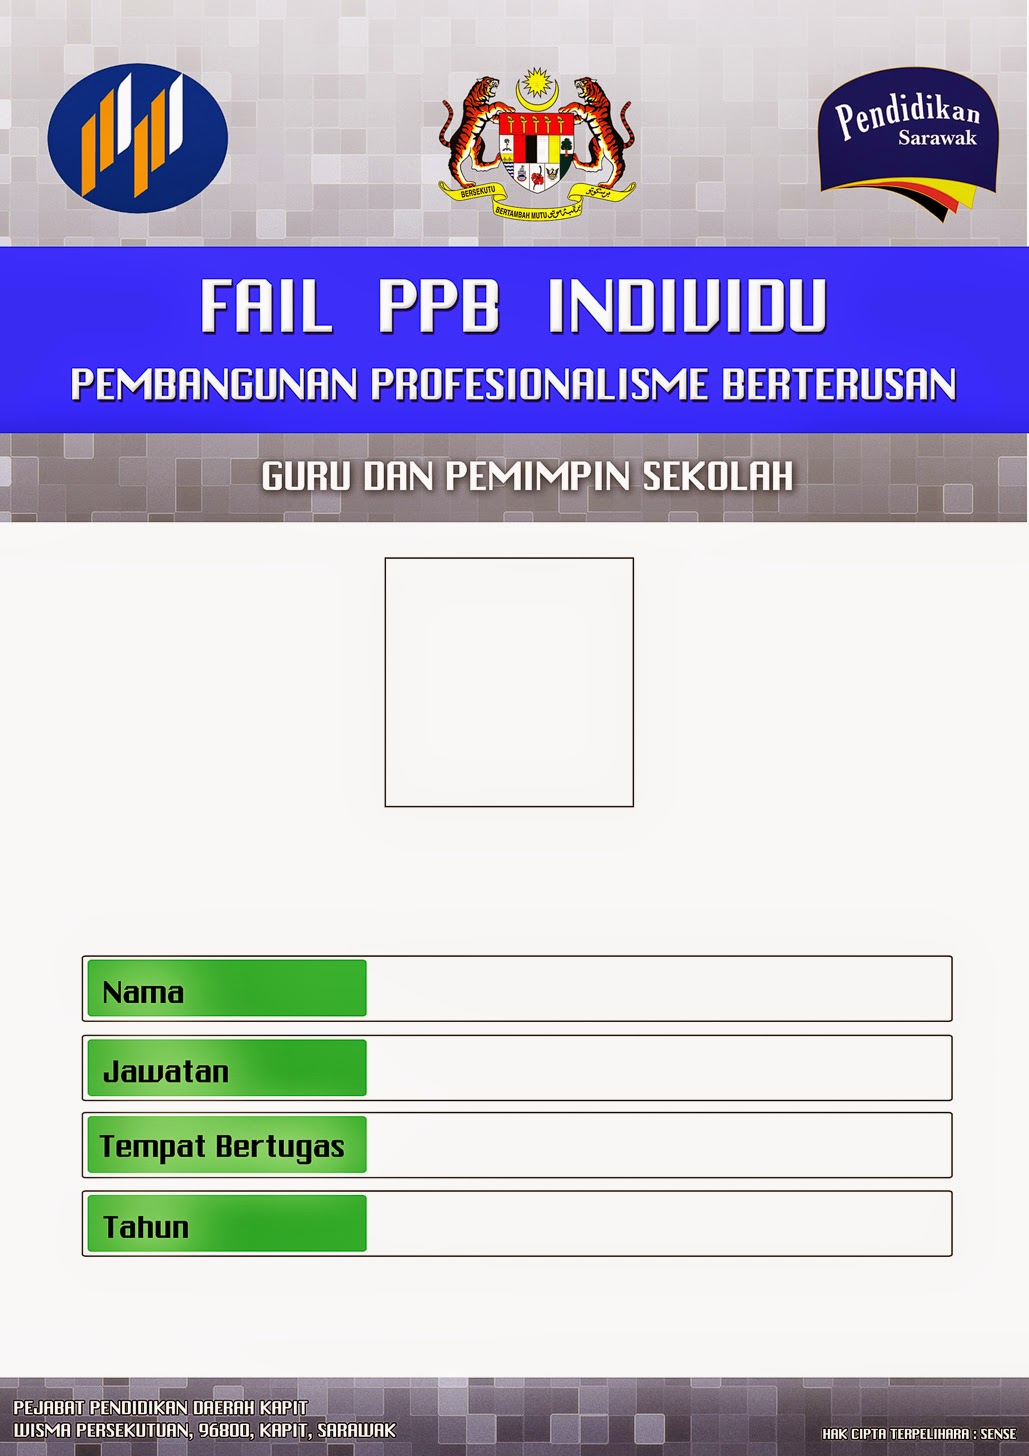 Muka depan fail ppb edisi sense nadi ilmu balleh muka depan fail ppb edisi sense altavistaventures Choice Image